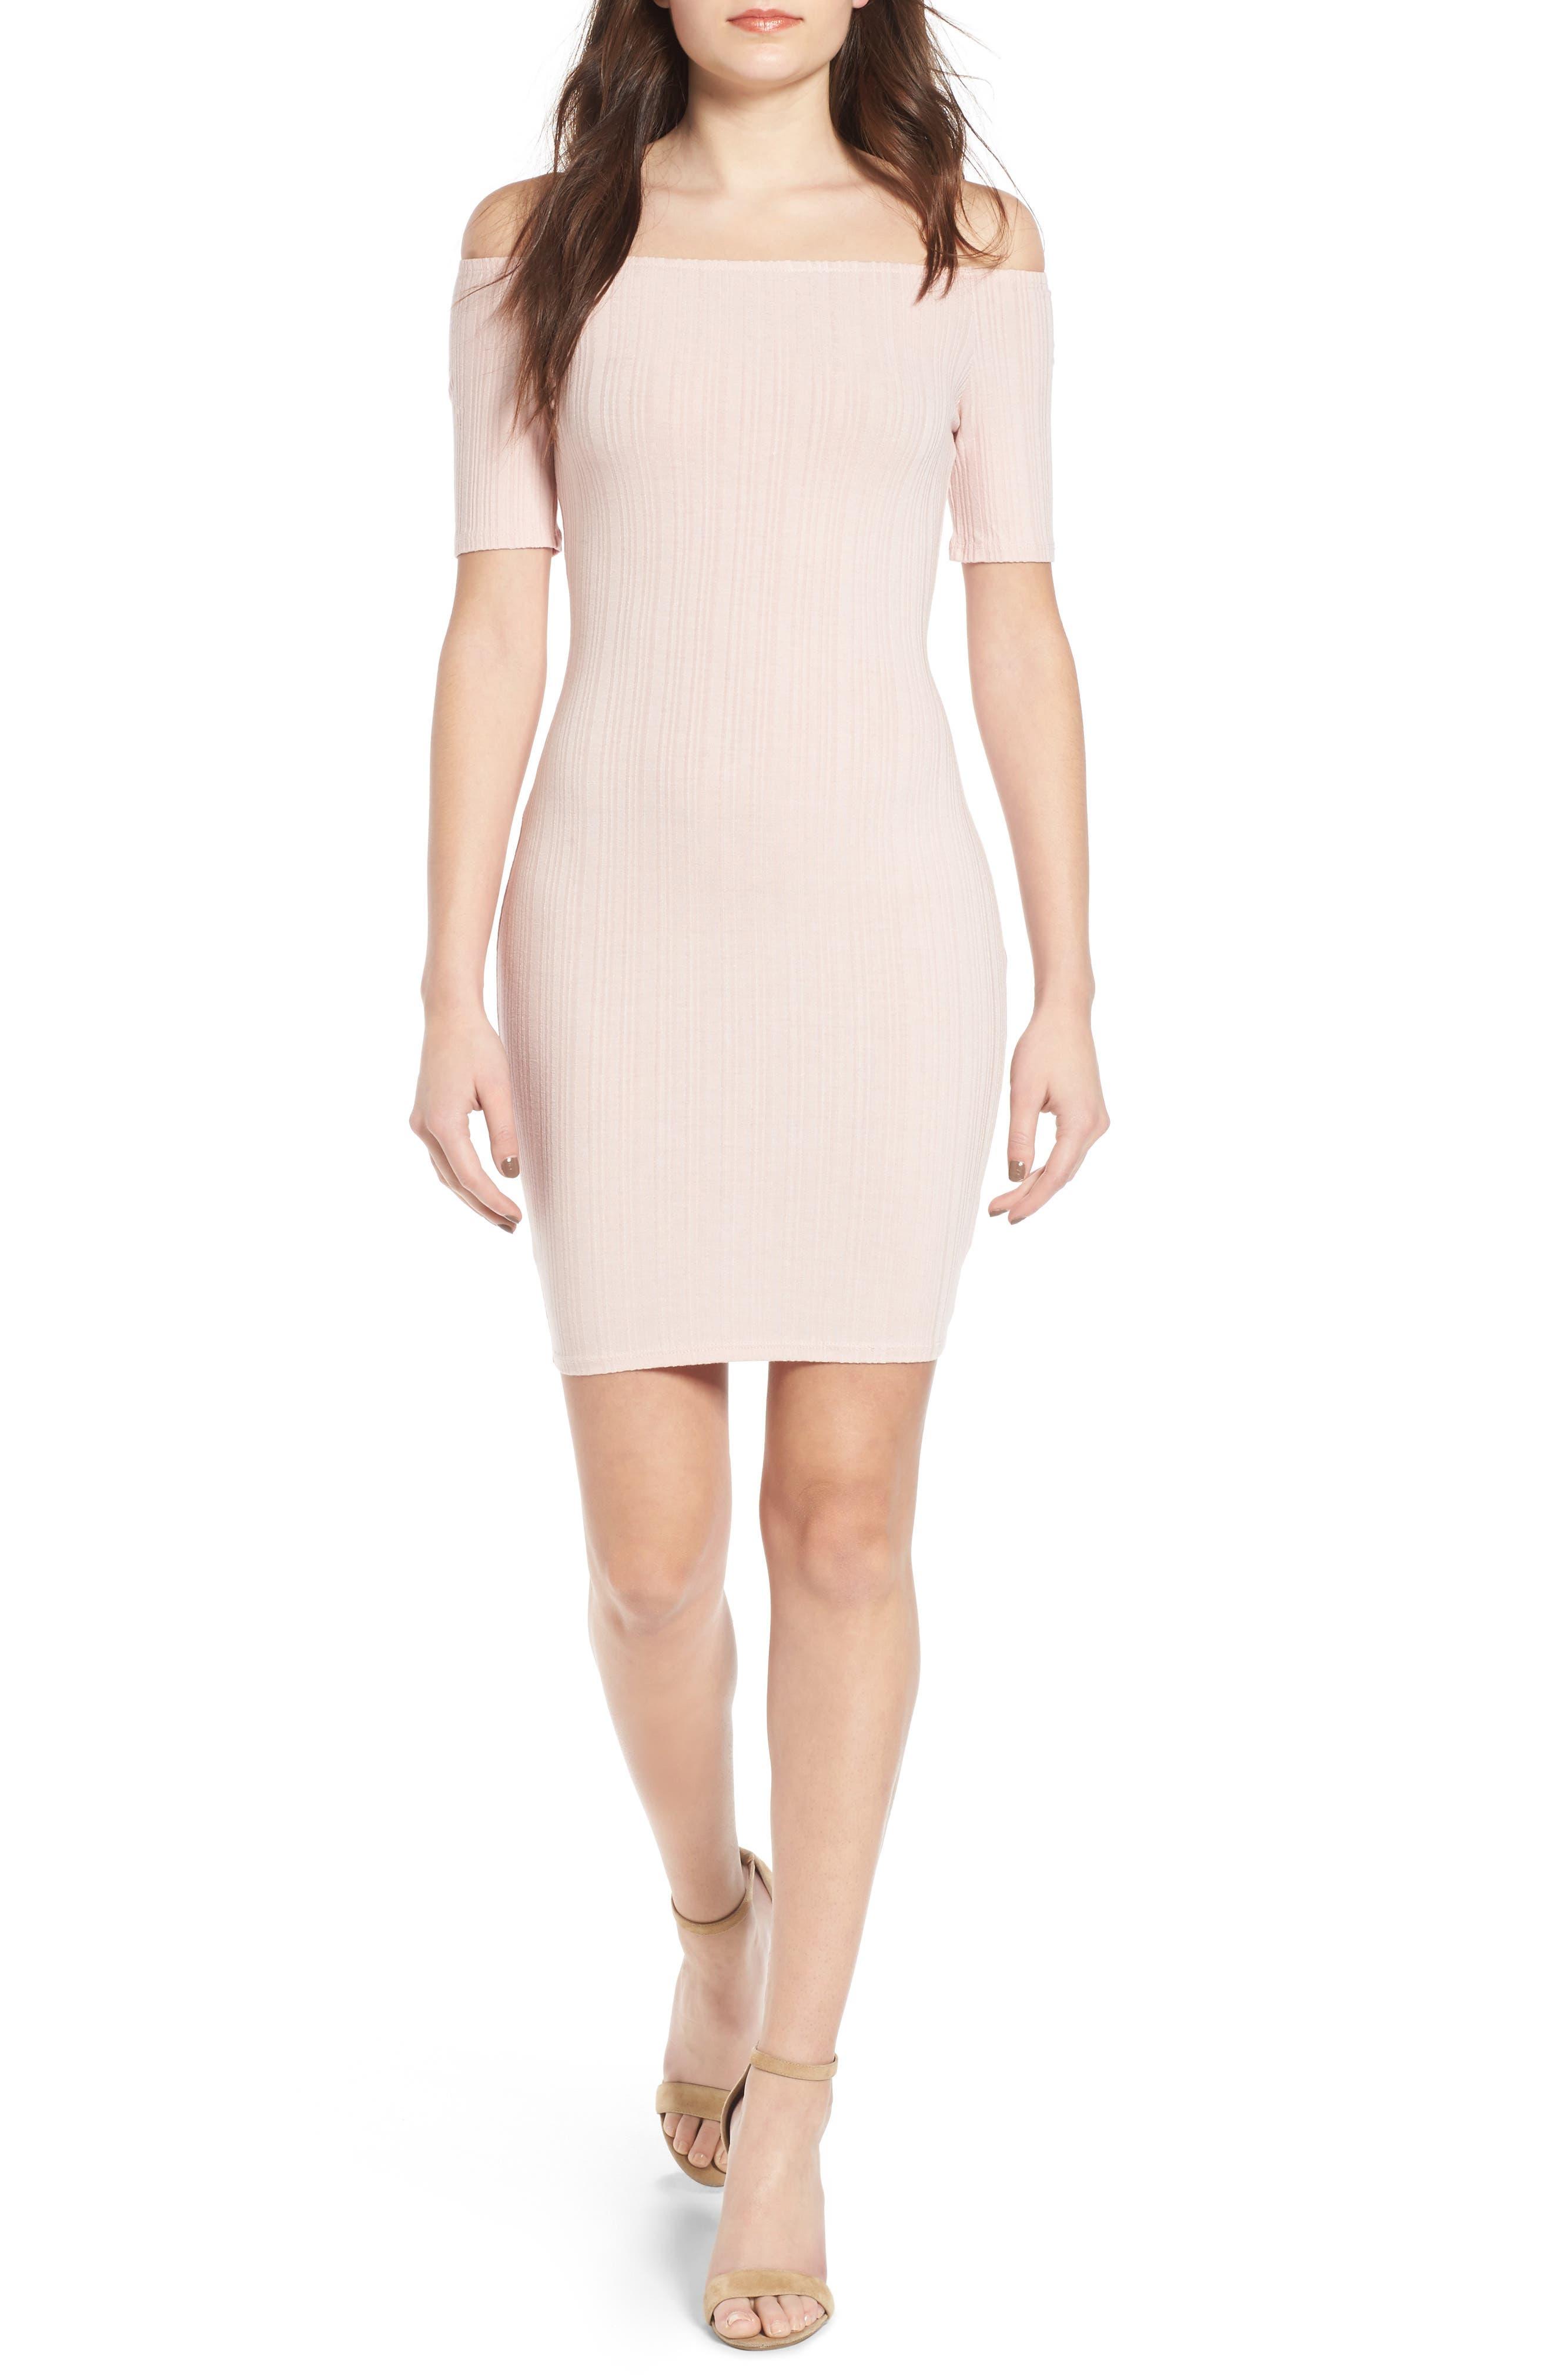 Main Image - Michelle by Comune Bellmead Off-the-Shoulder Dress